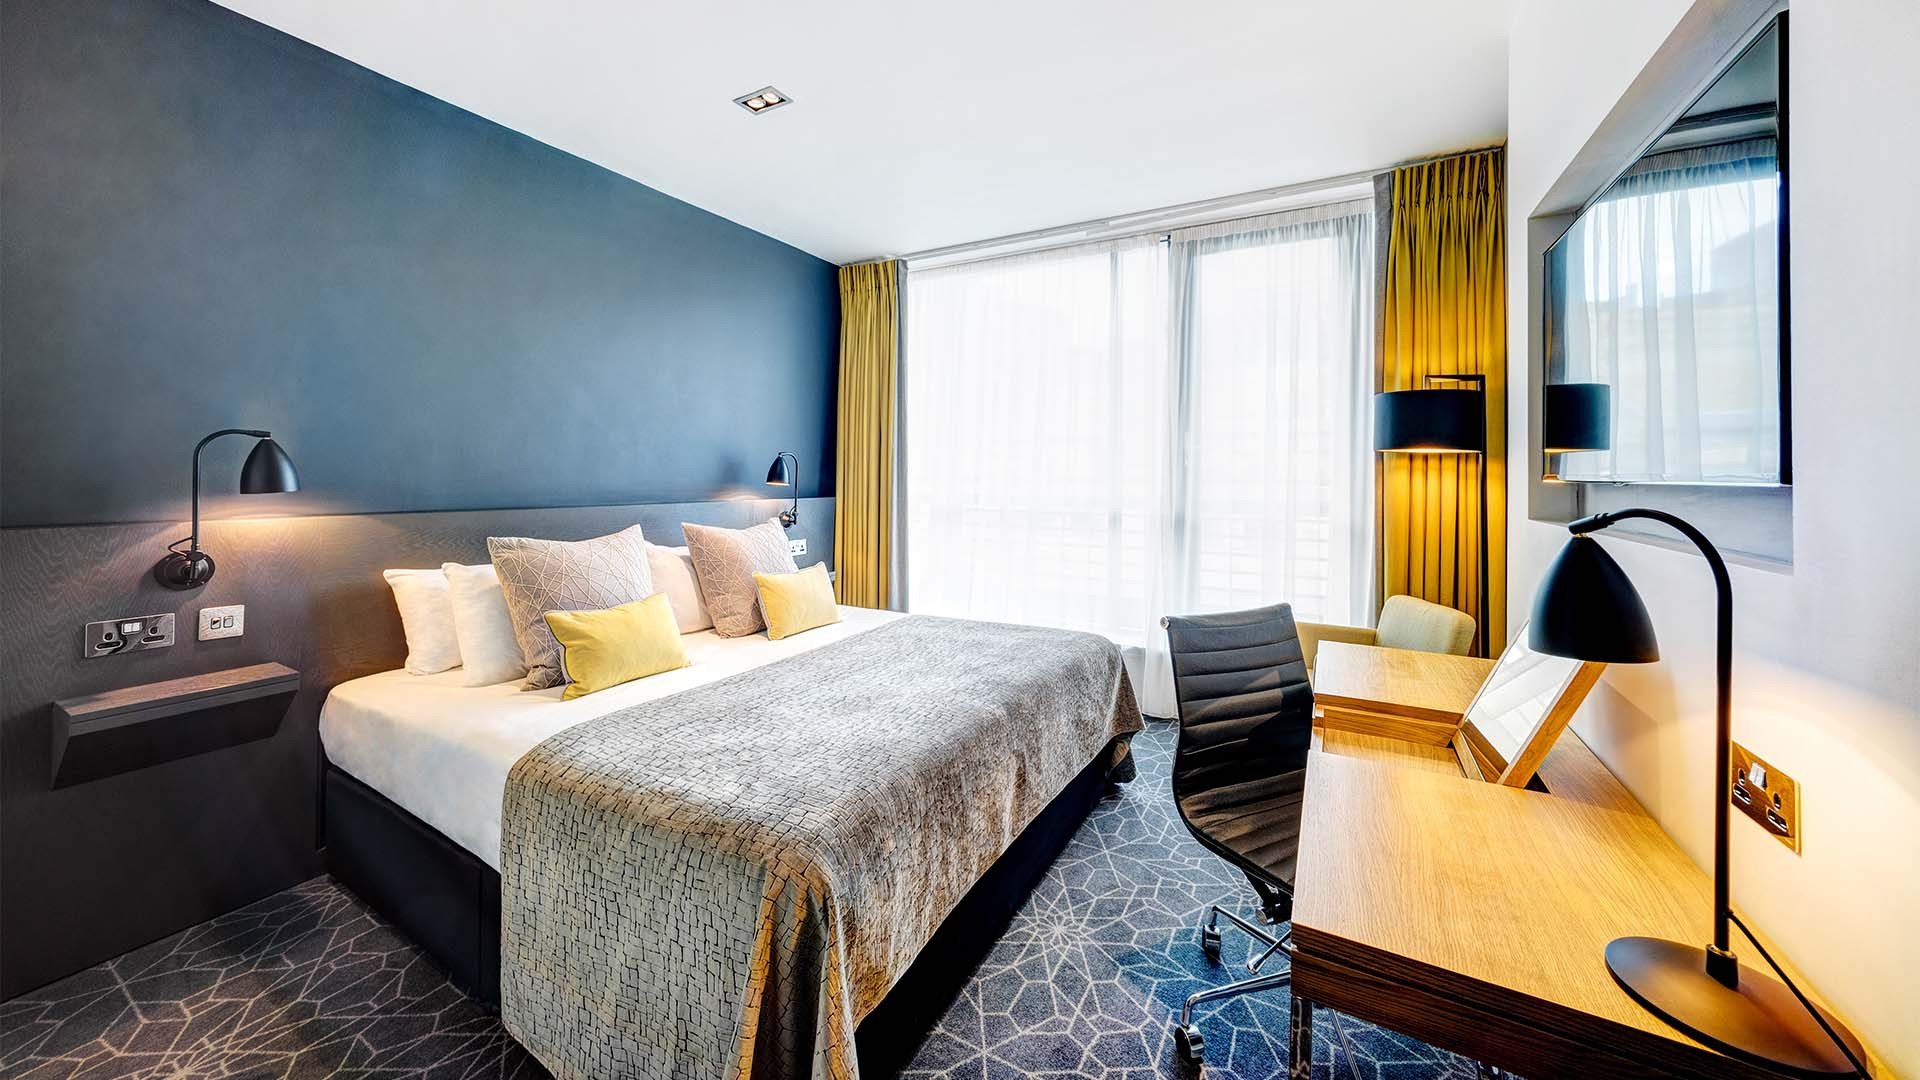 Room at Apex City of Bath Hotel, Bath, UK